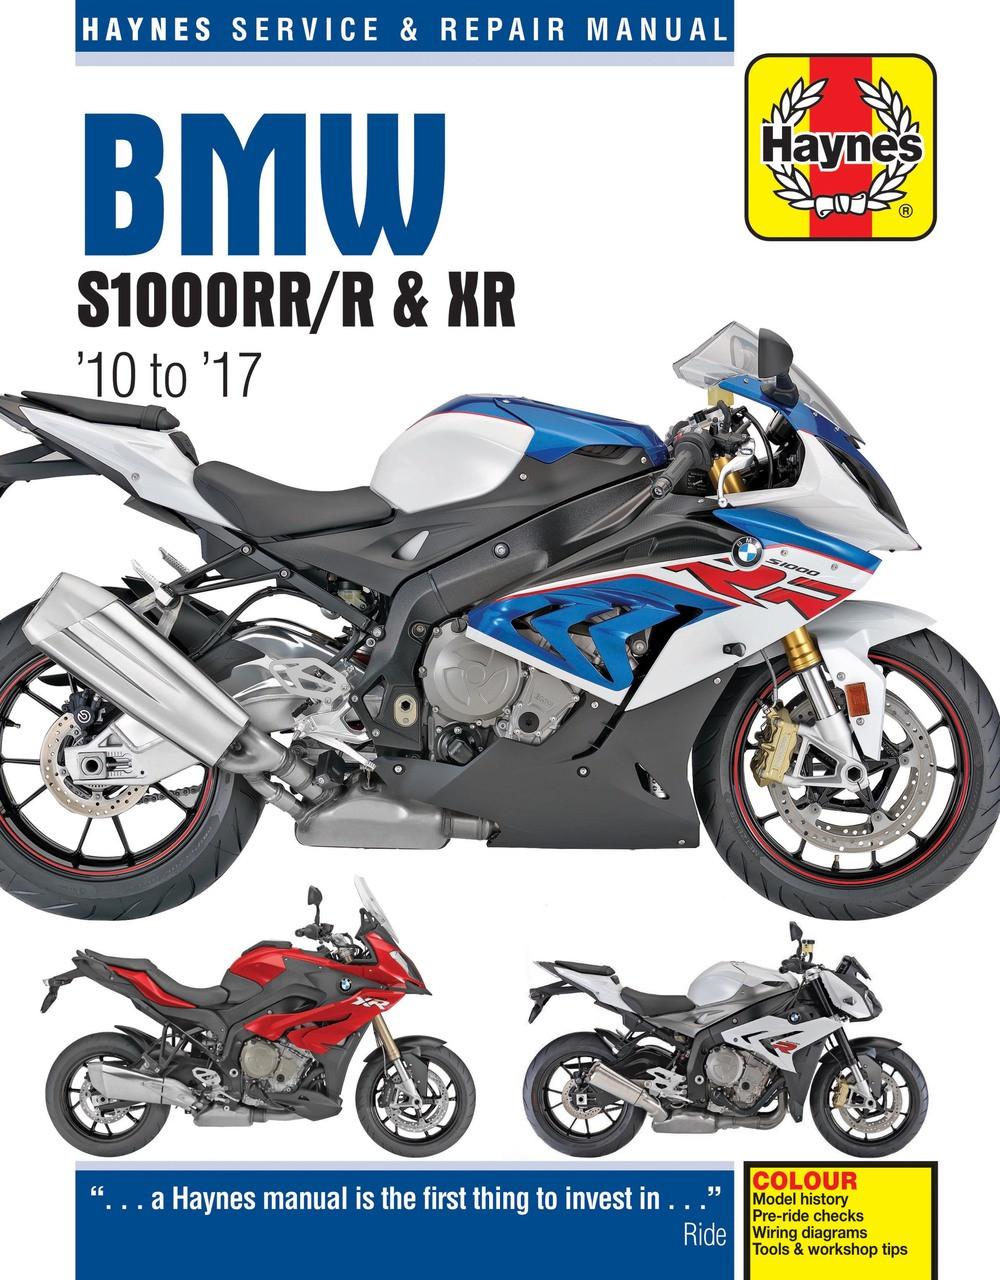 bmw s1000rr s1000r s1000xr 2010 2017 workshop manual [ 1000 x 1280 Pixel ]